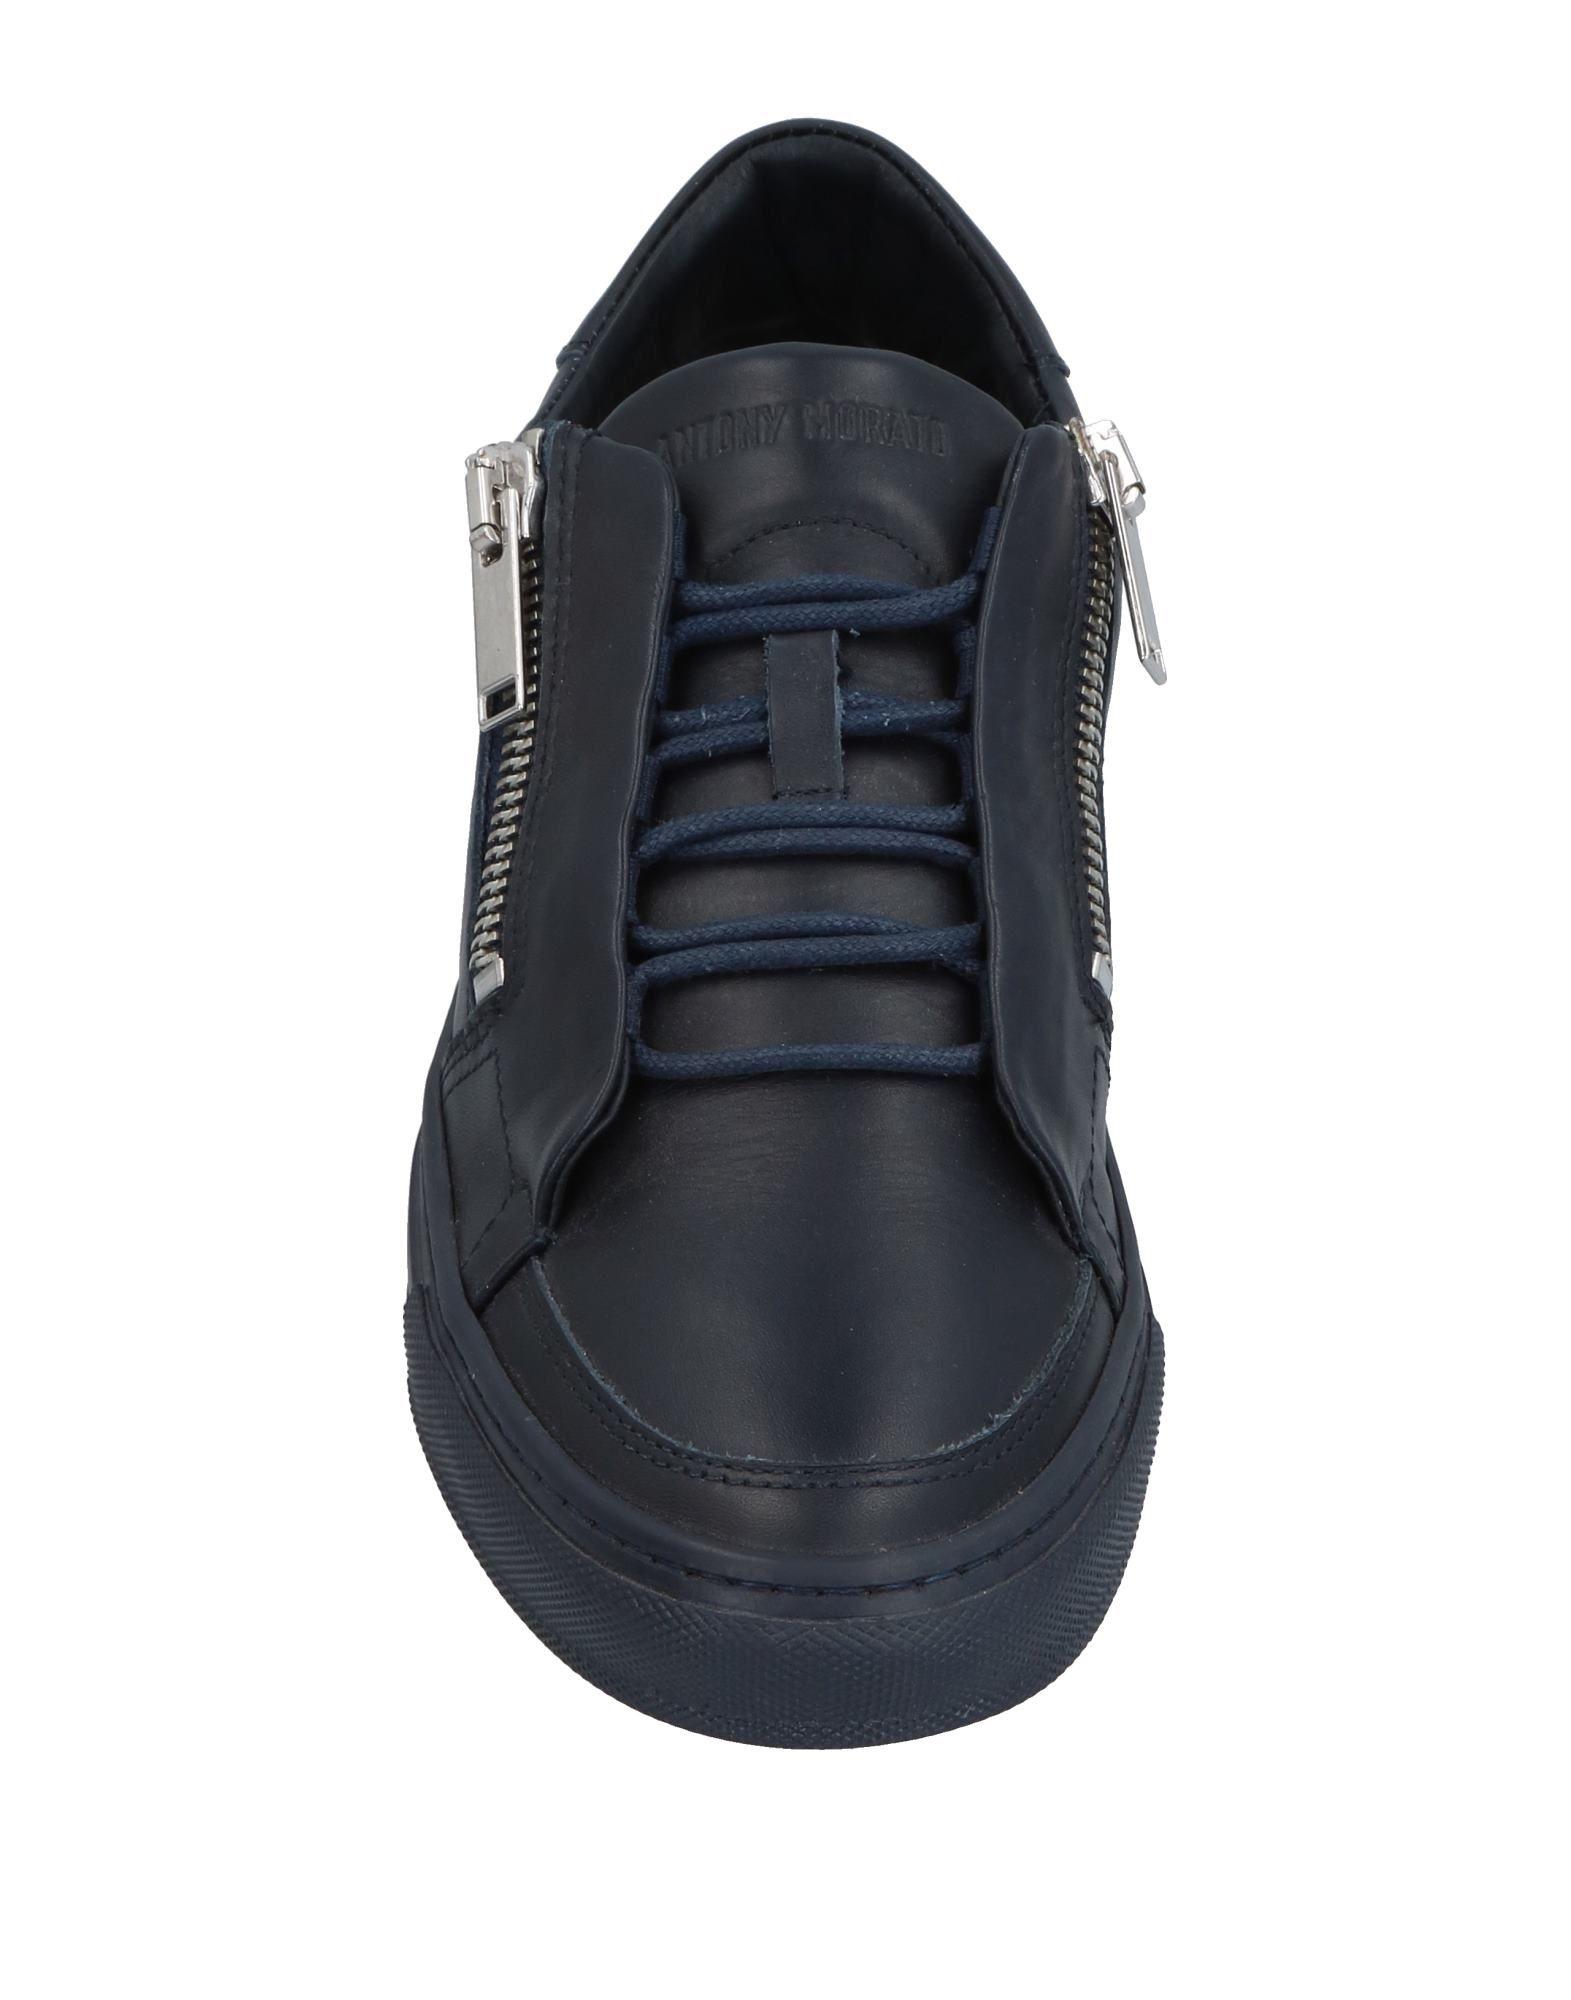 Rabatt Morato echte Schuhe Antony Morato Rabatt Turnschuhes Herren 11396657FL 5346cd